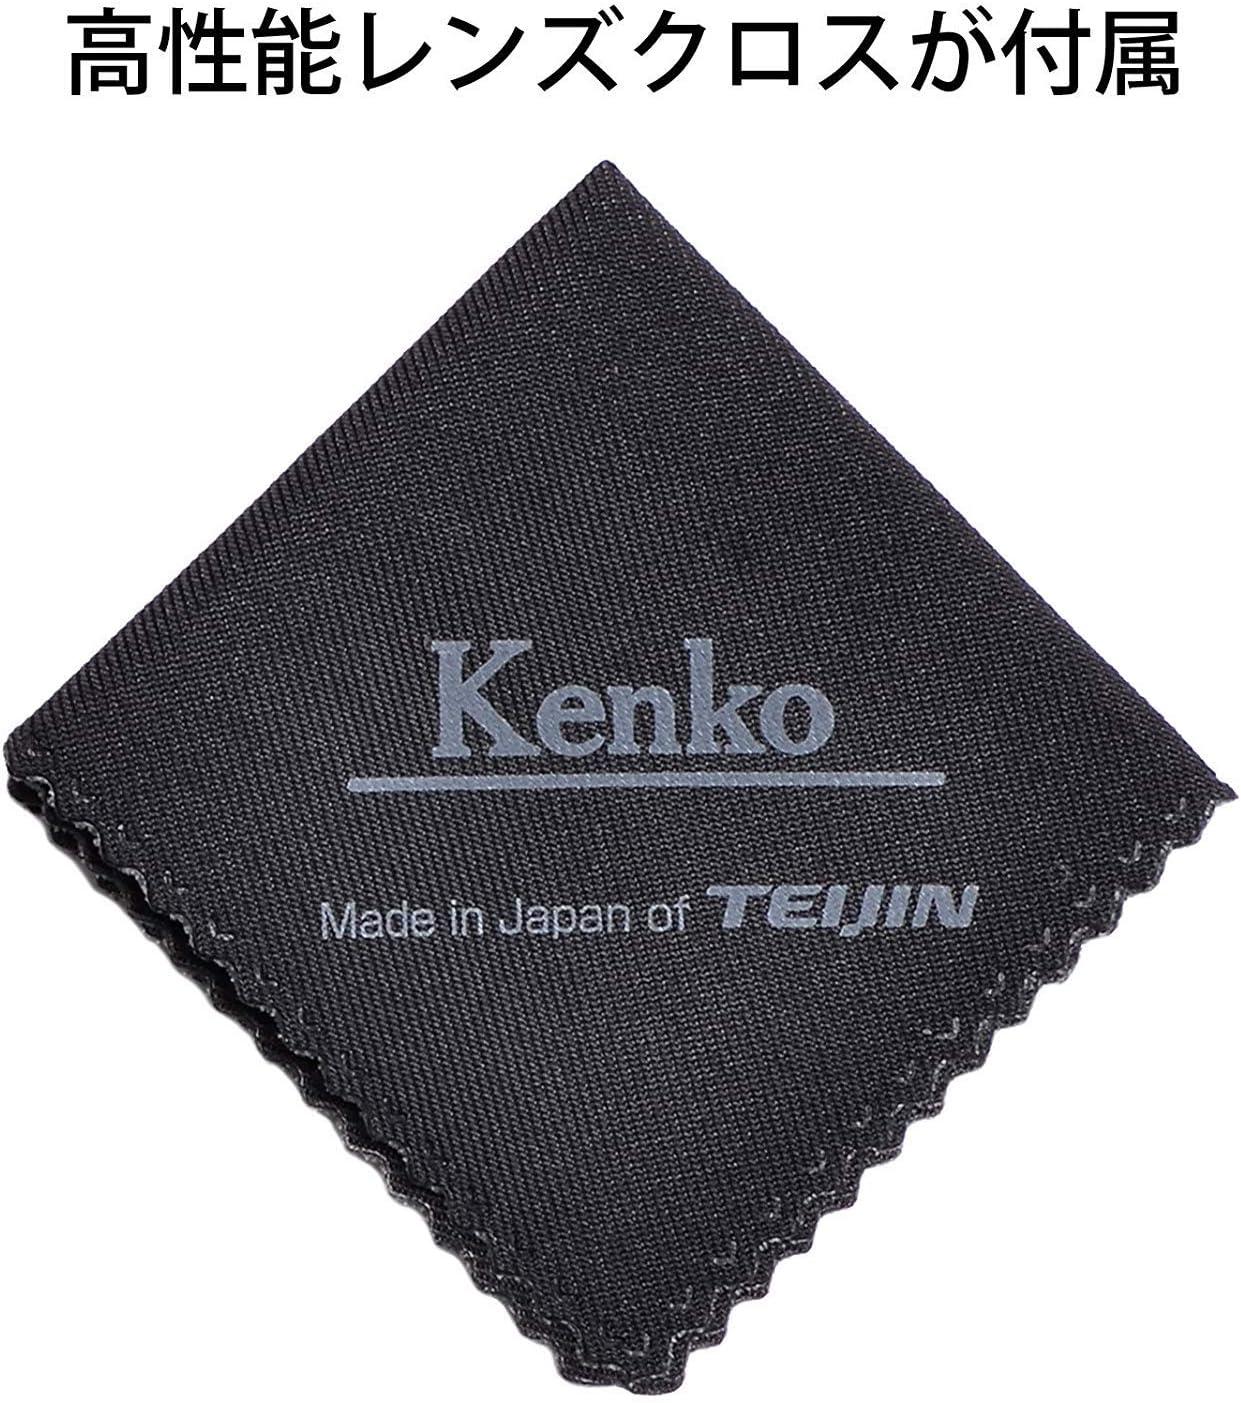 Kenko 72mm Zeta Protector ZR-Coated Slim Frame Camera Lens Filters